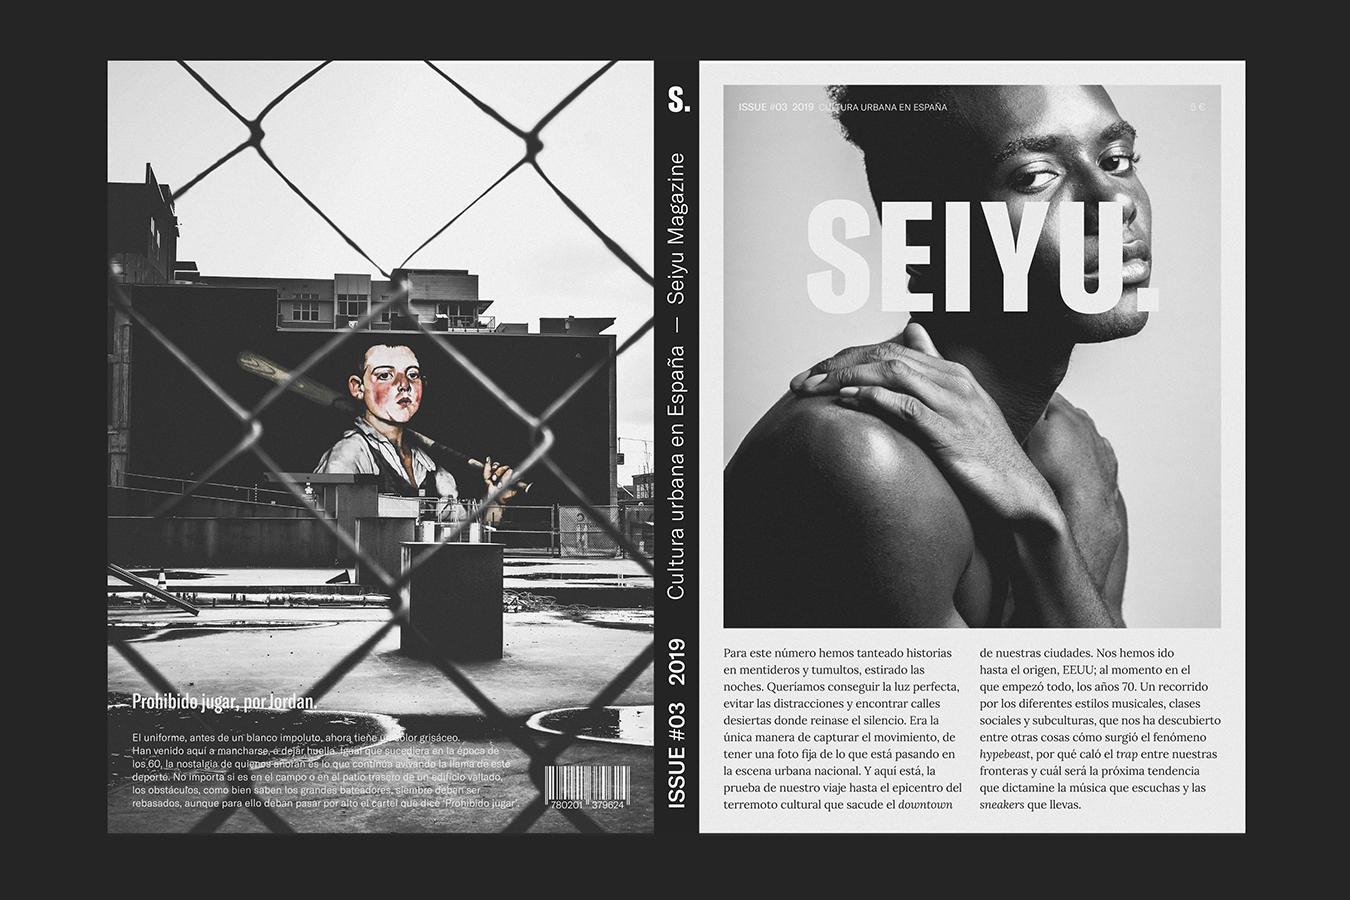 seiyu_4_magazine